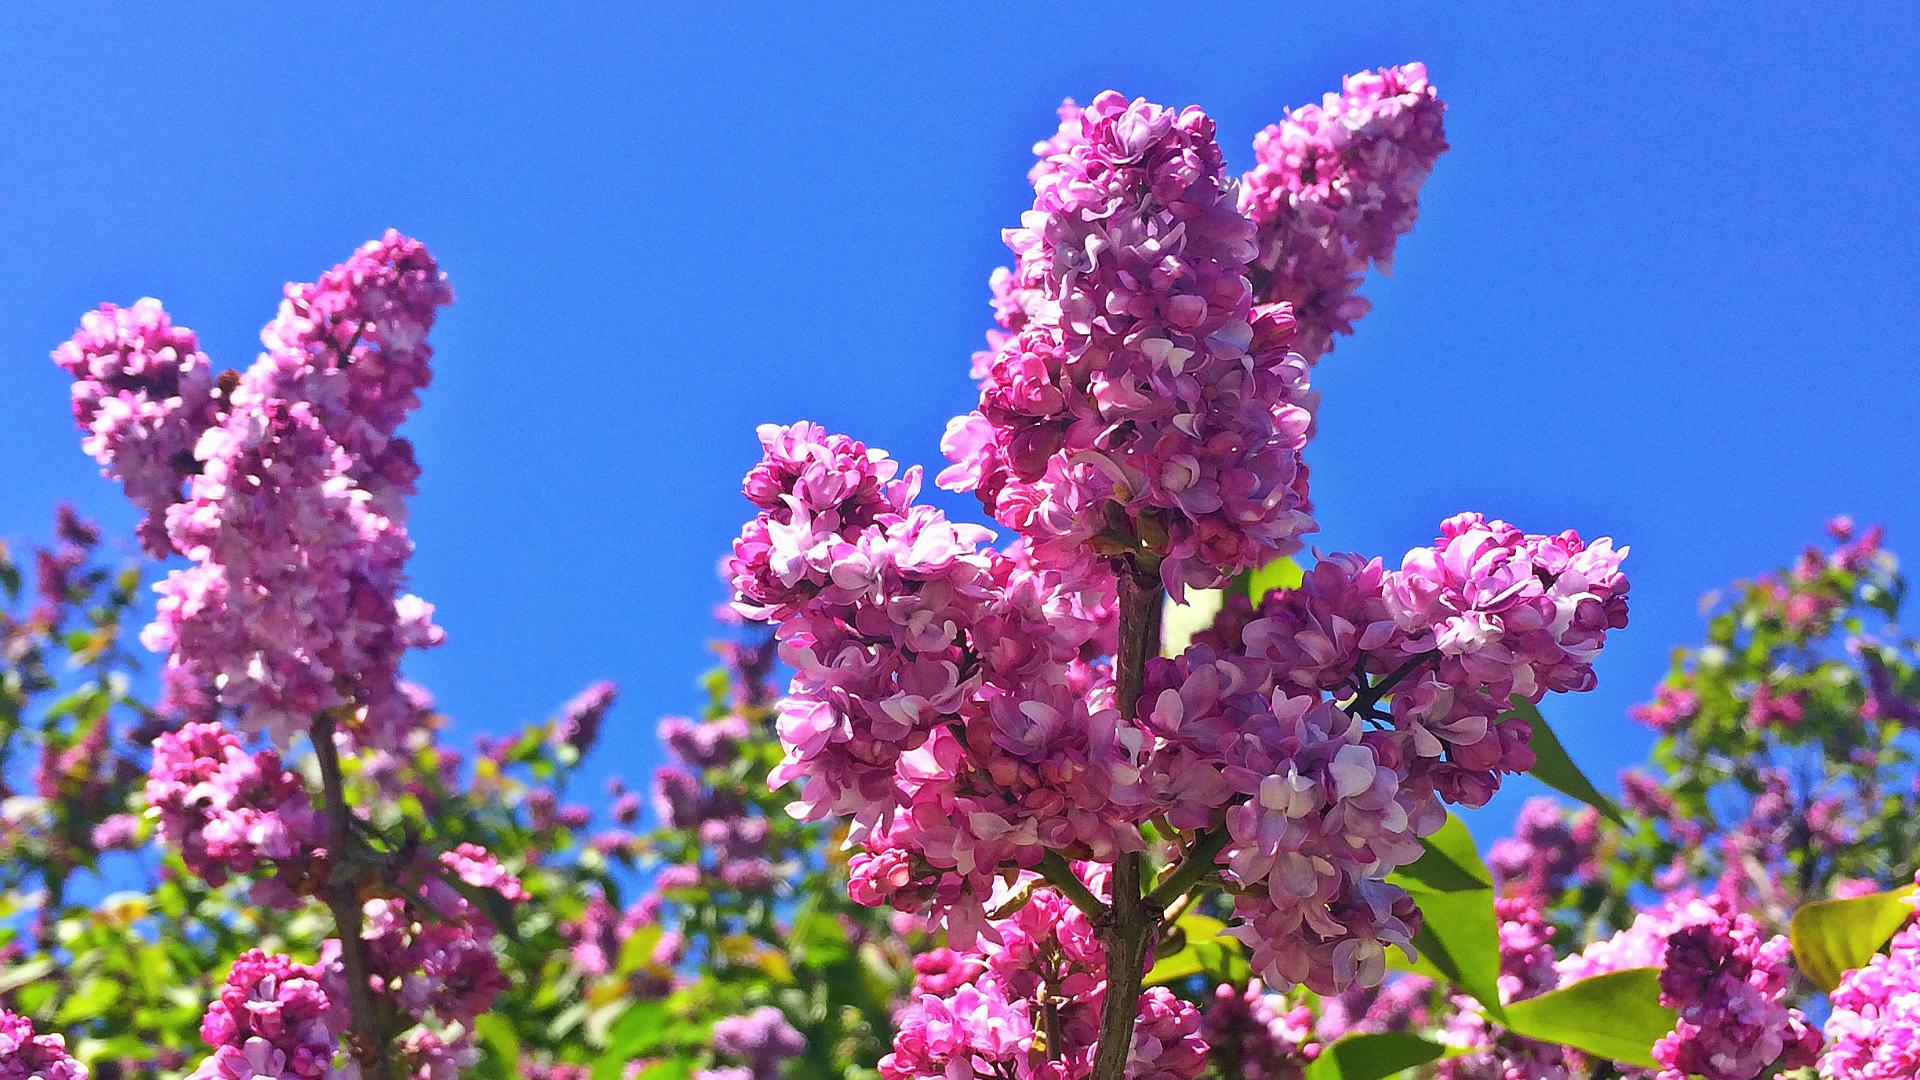 Rochester Lilac Festival 2020.Lilac Festival Announces 2020 Dates New Entertainment